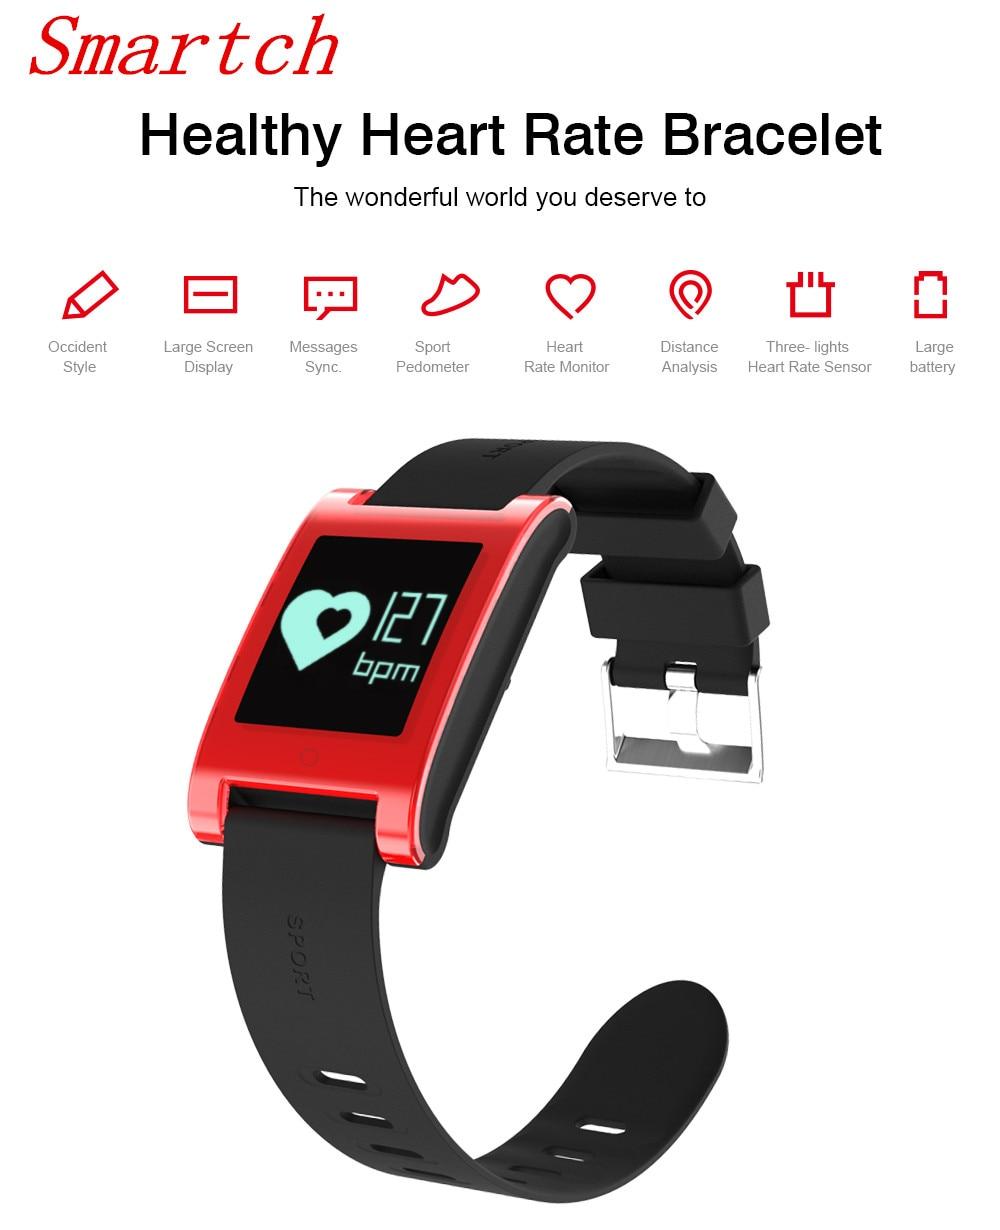 Smartch Smart Bracelet Bracelets Health DM68 Pedometer Pulsera Actividad Fitness Pulse Monitor Activity Blood Pressure Tracker